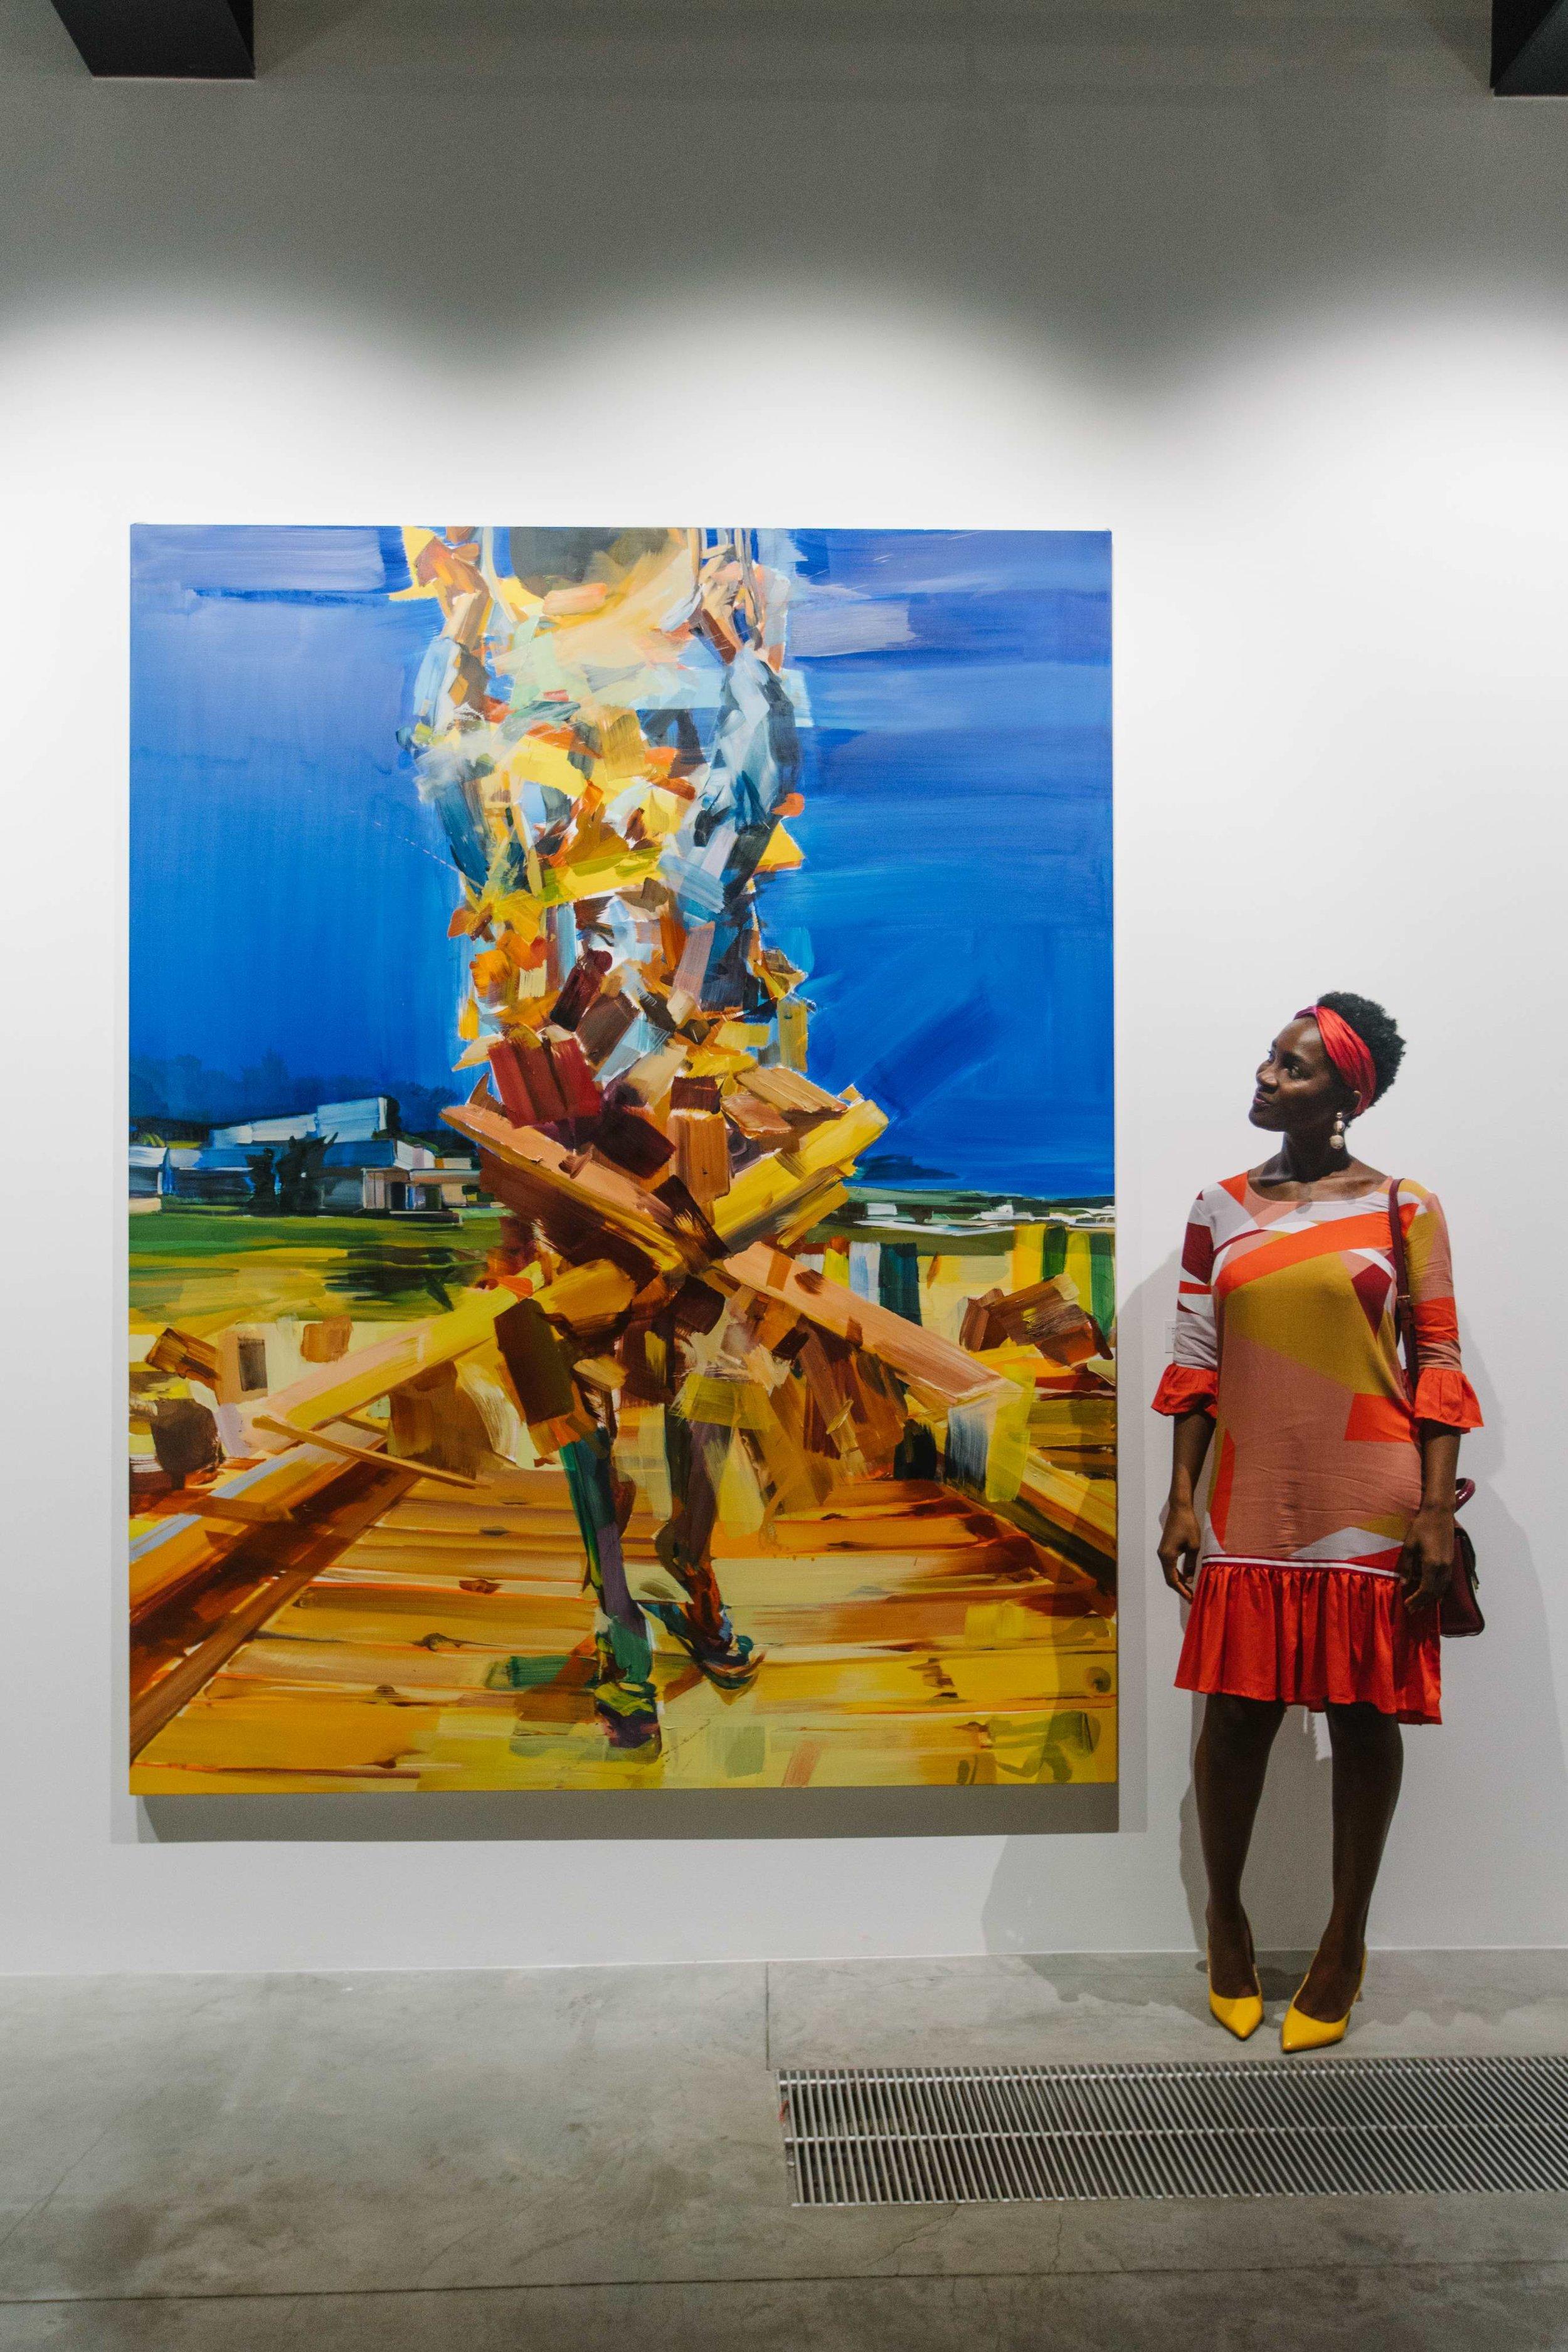 AAbout the World , Barthélémy Toguo - Duncan Wylie, Hangar Arts Centre, Brussels, Sept/Oct 2018, curator Philip Piguet